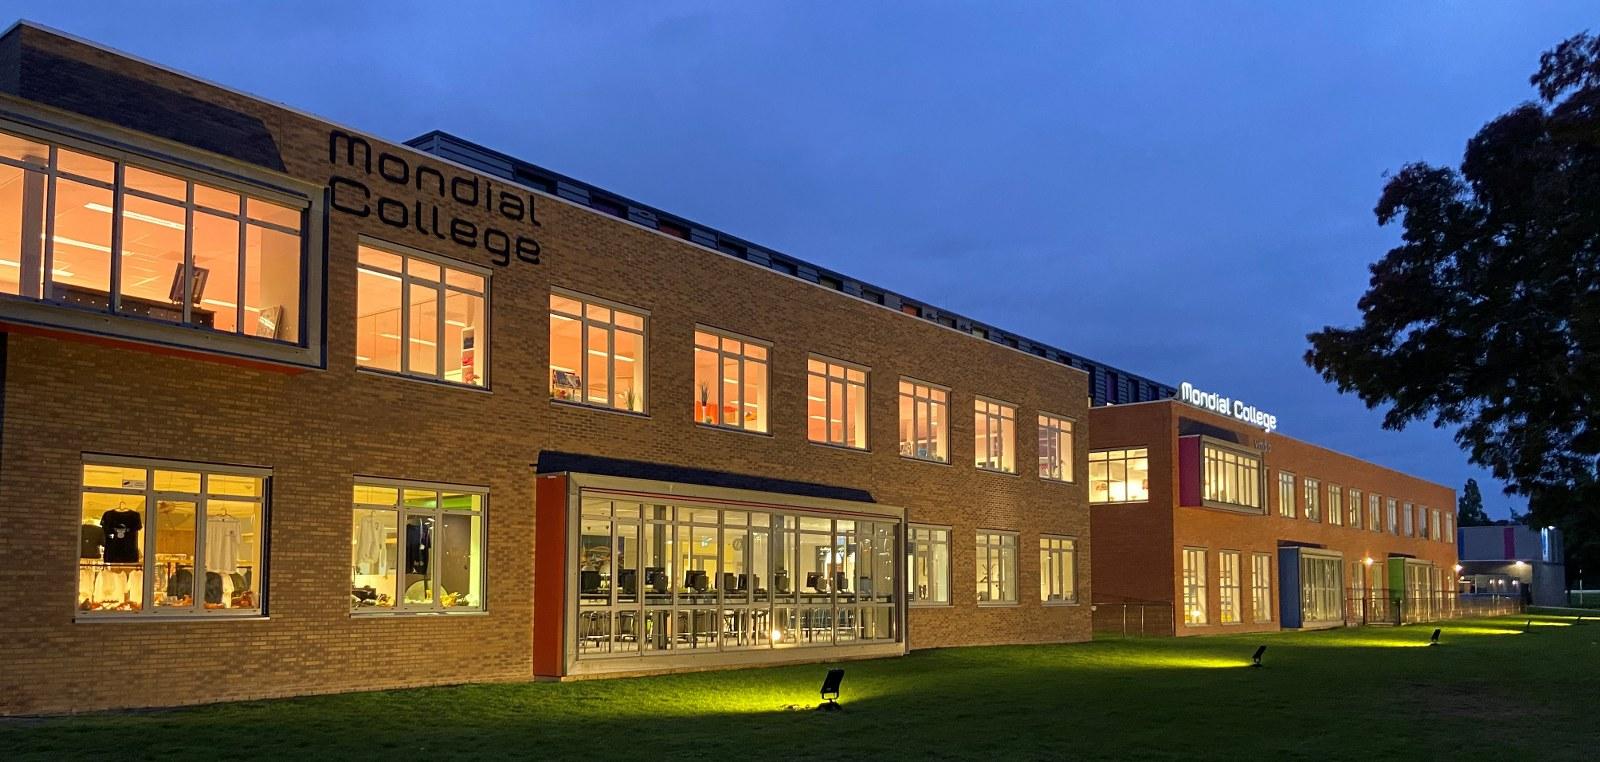 Buitenverlichting Mondial College Meeuwse Acker Nijmegen